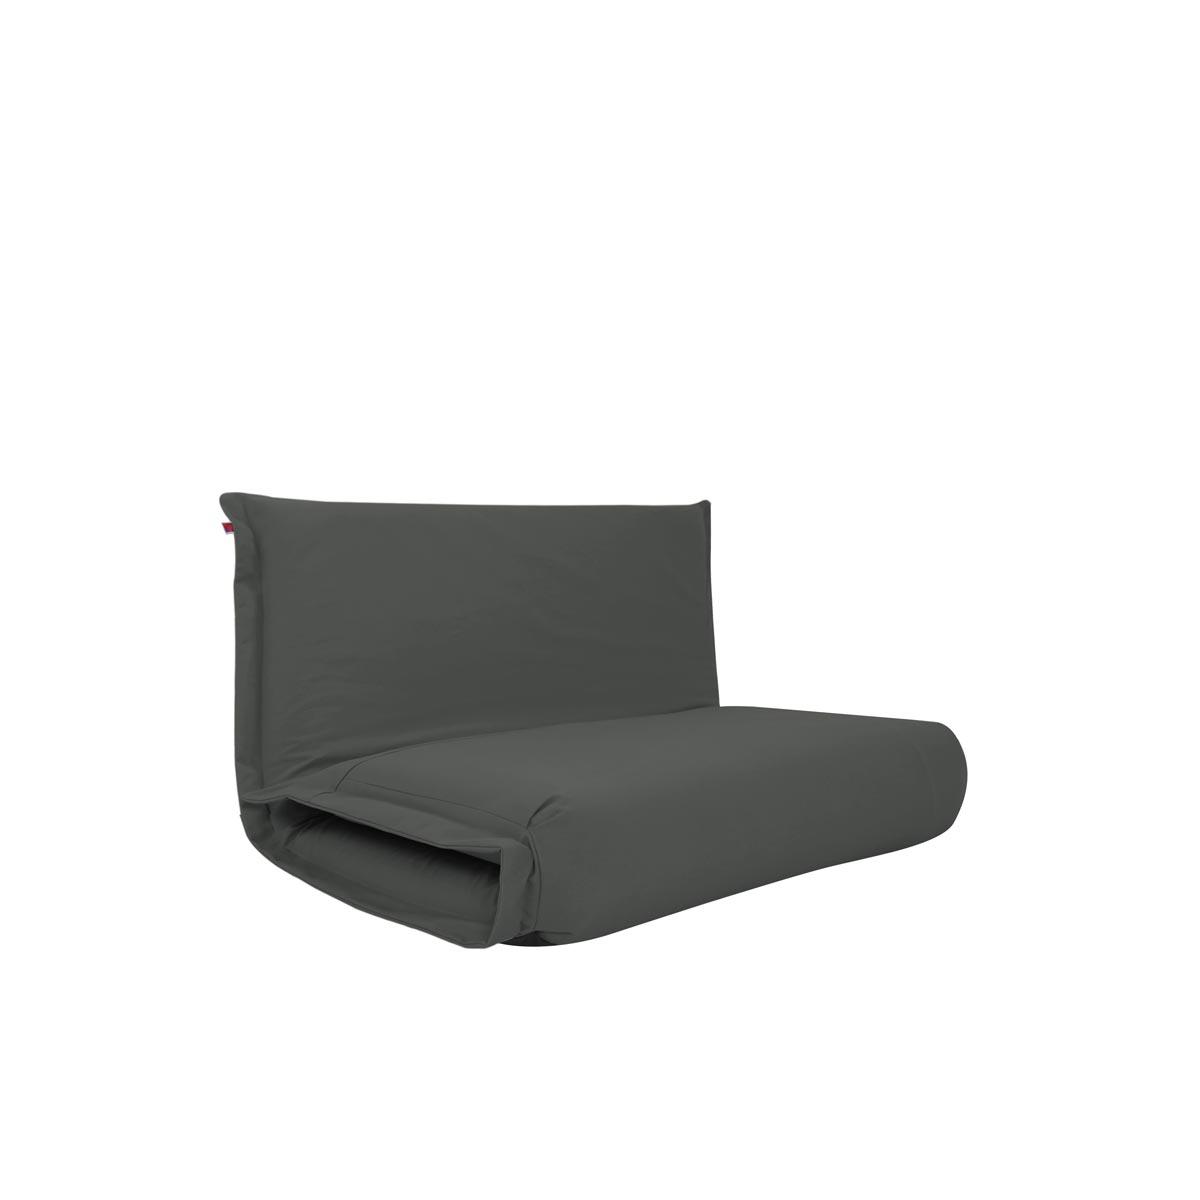 Pufe ClicClac Duo Lounge Tecido LN03 Cinza Escuro 02 04